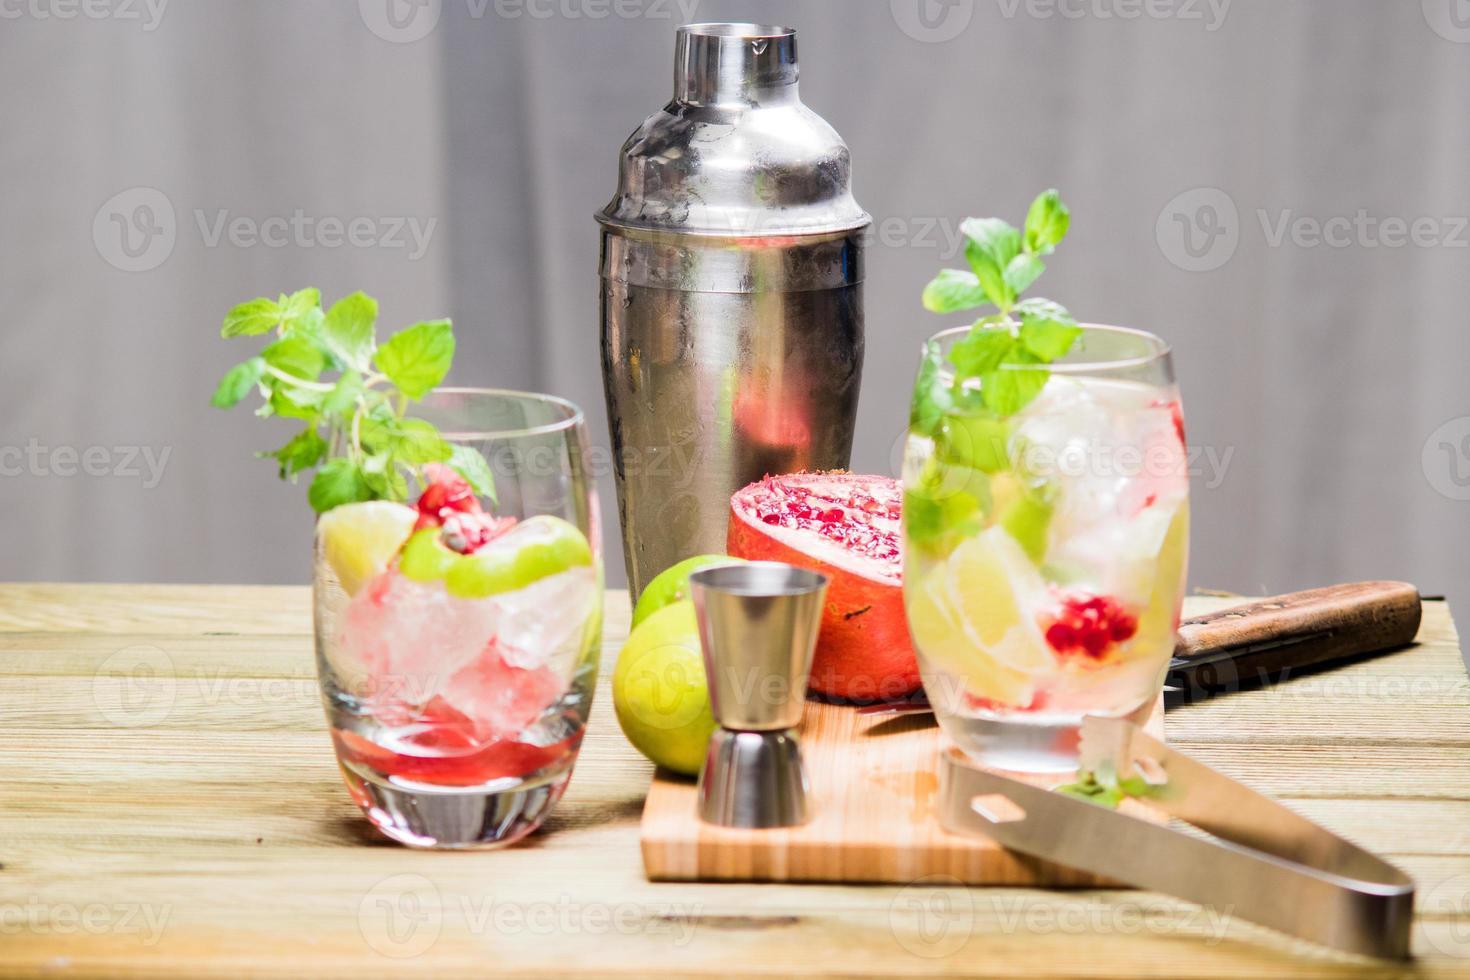 mojito-cocktailbereidingen foto